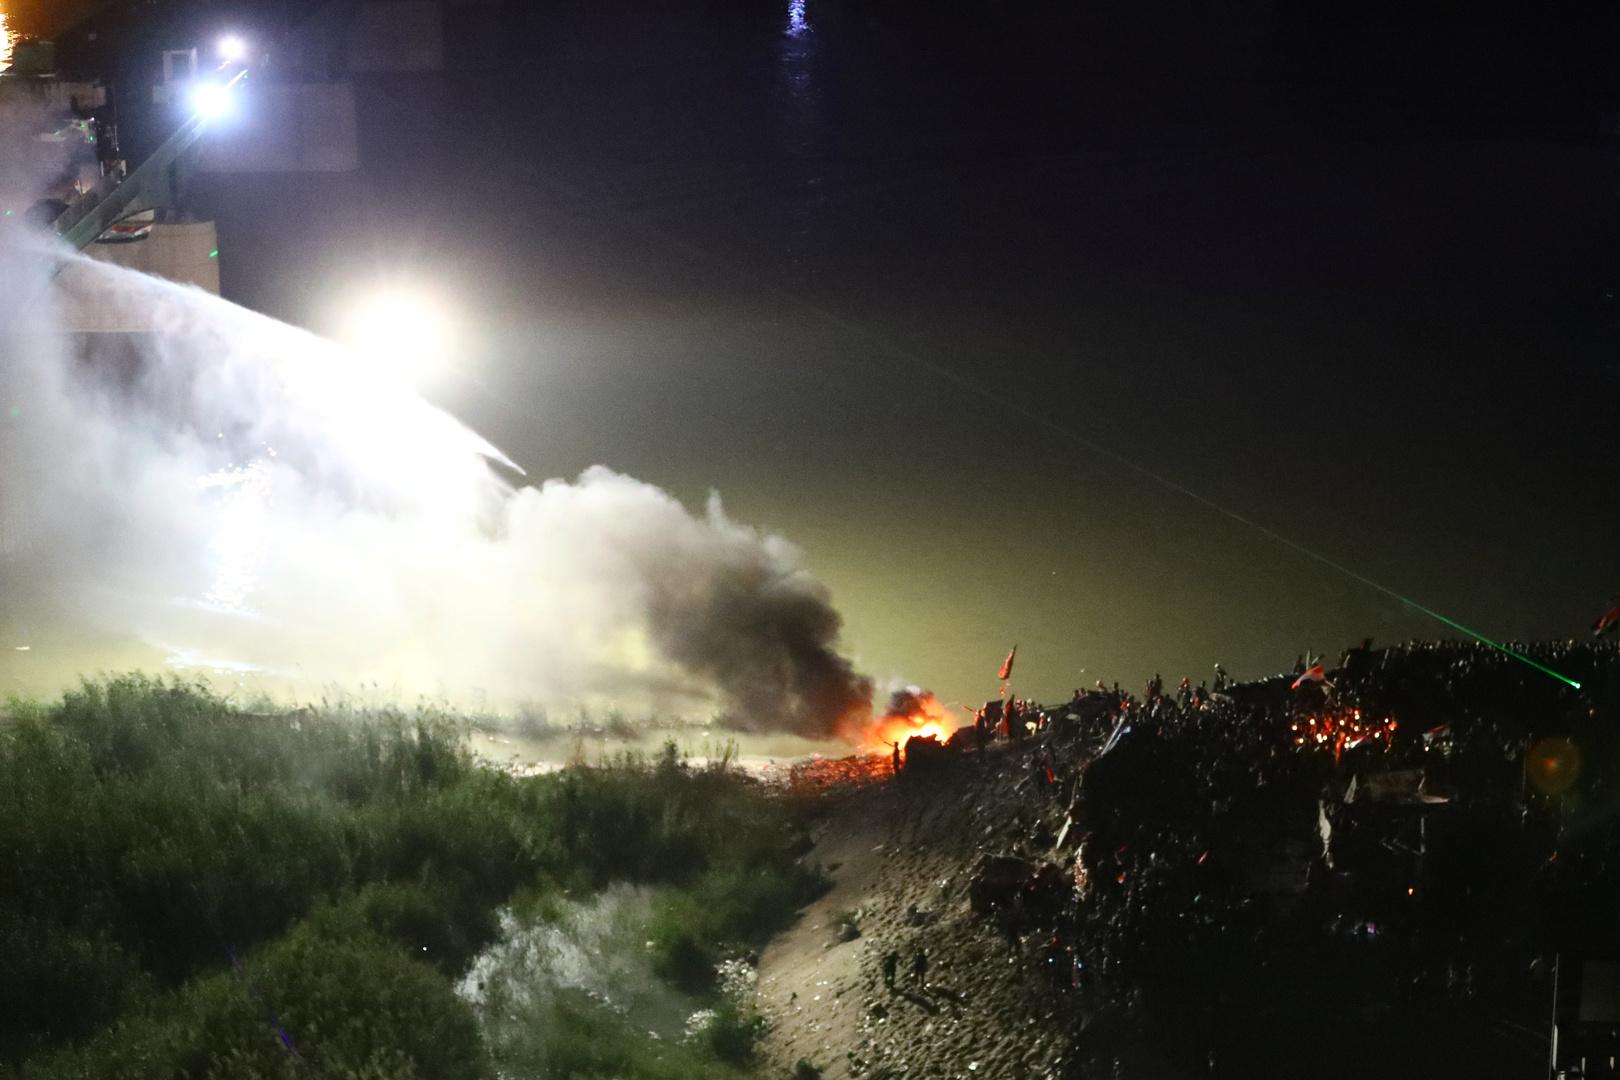 سماع دوي انفجار في بغداد